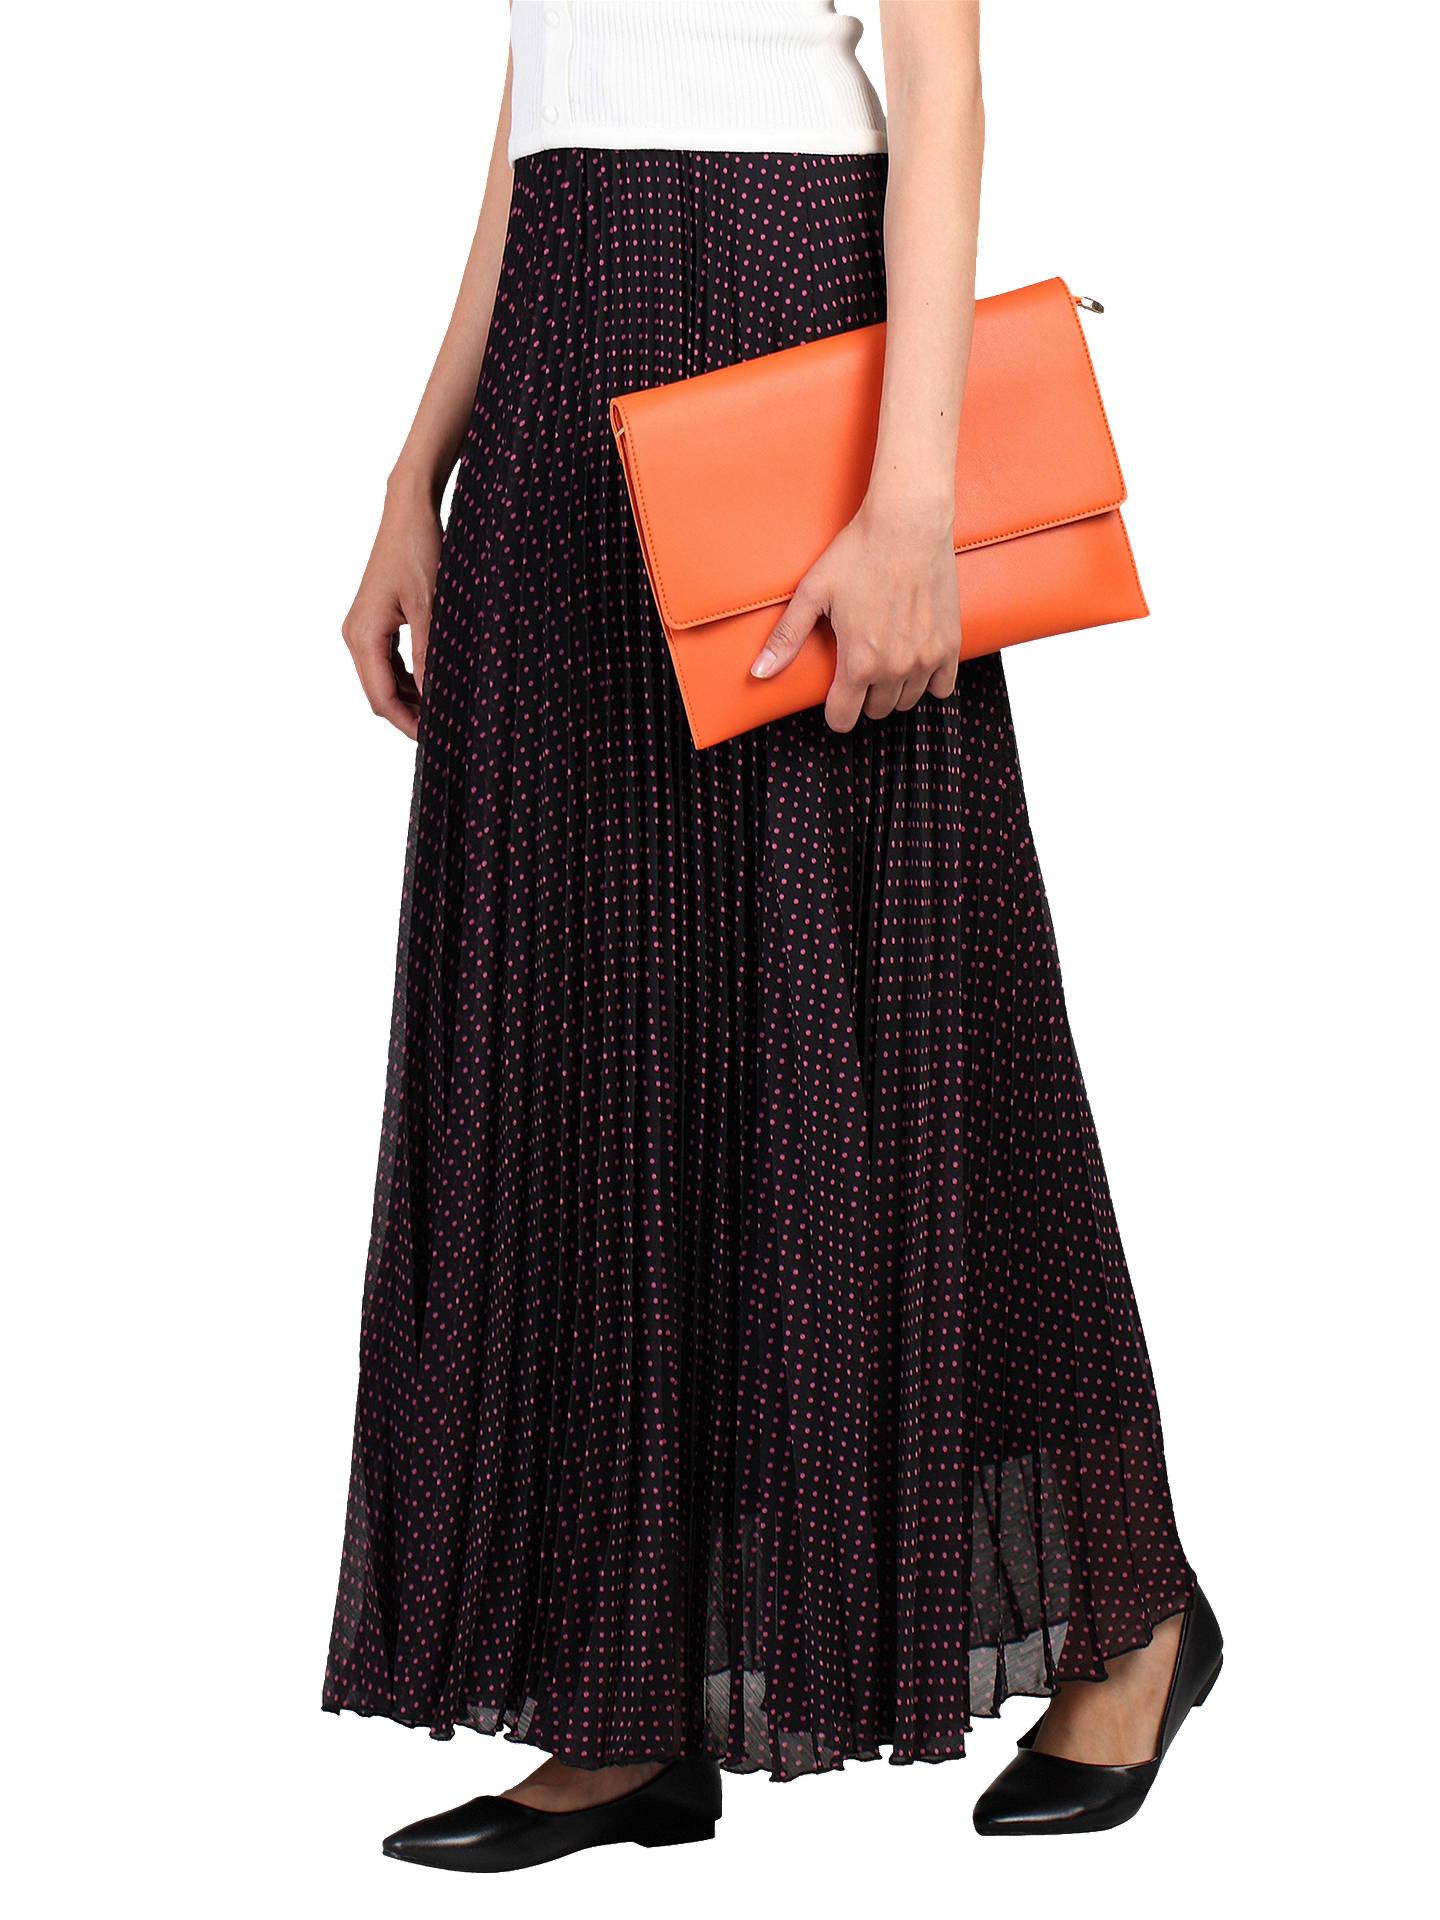 Jolie Moi Spot Print Pleated Maxi Skirt At John Lewis Partners Clothing Georgia Mini Dress Buyjolie Black Pink 16 Online Johnlewis